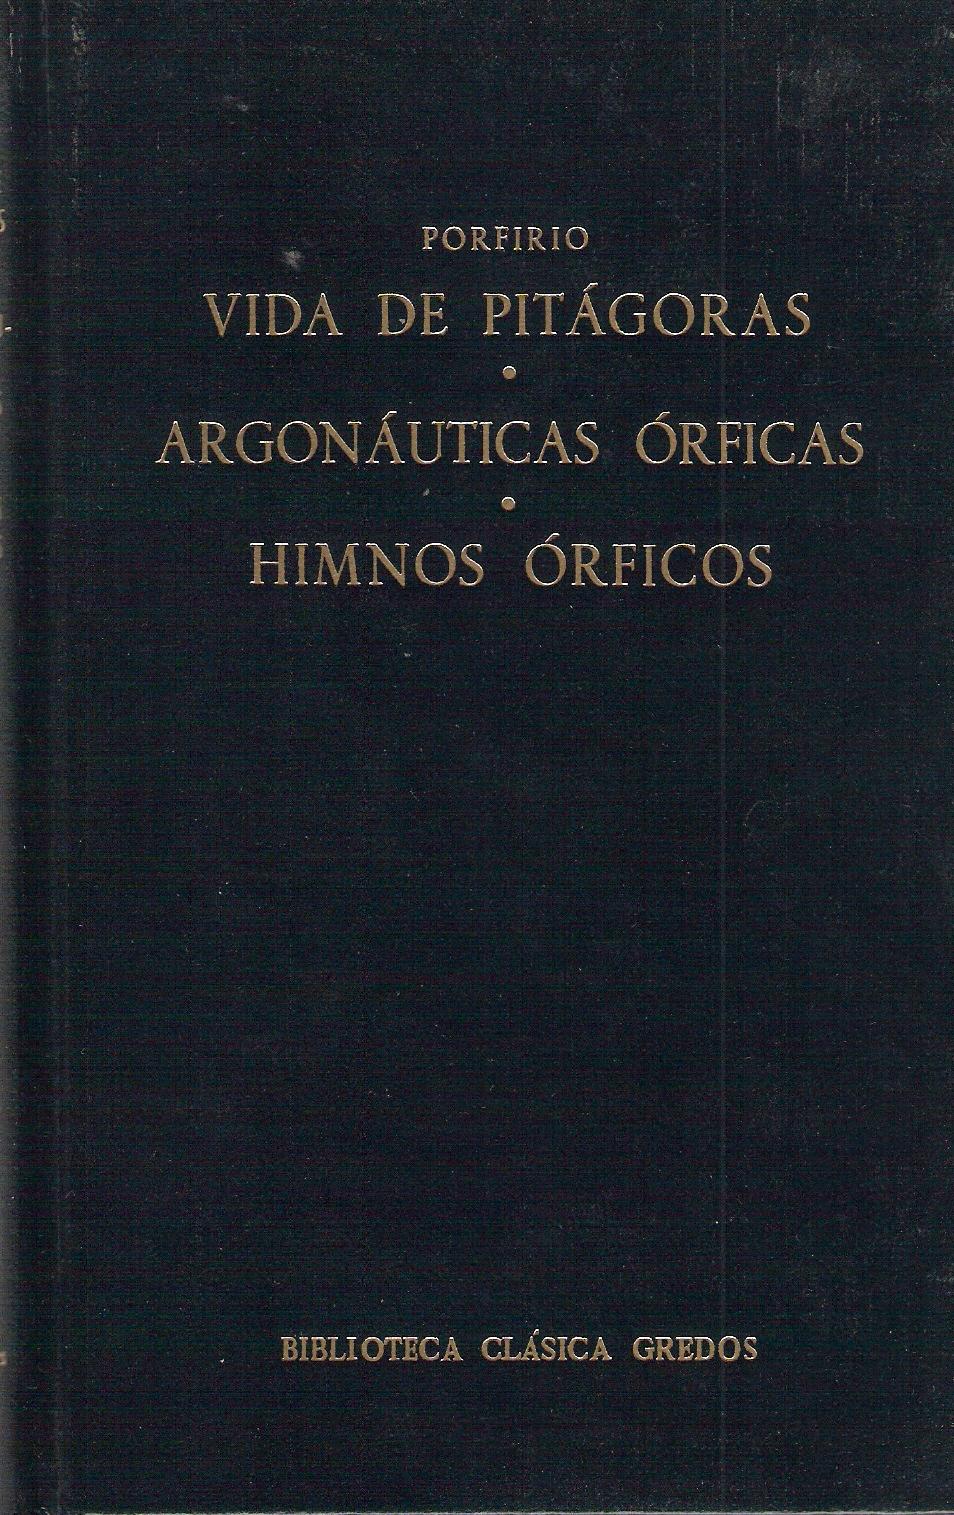 Vida de Pitágoras - Argonauticas orficas - Himnos órficos